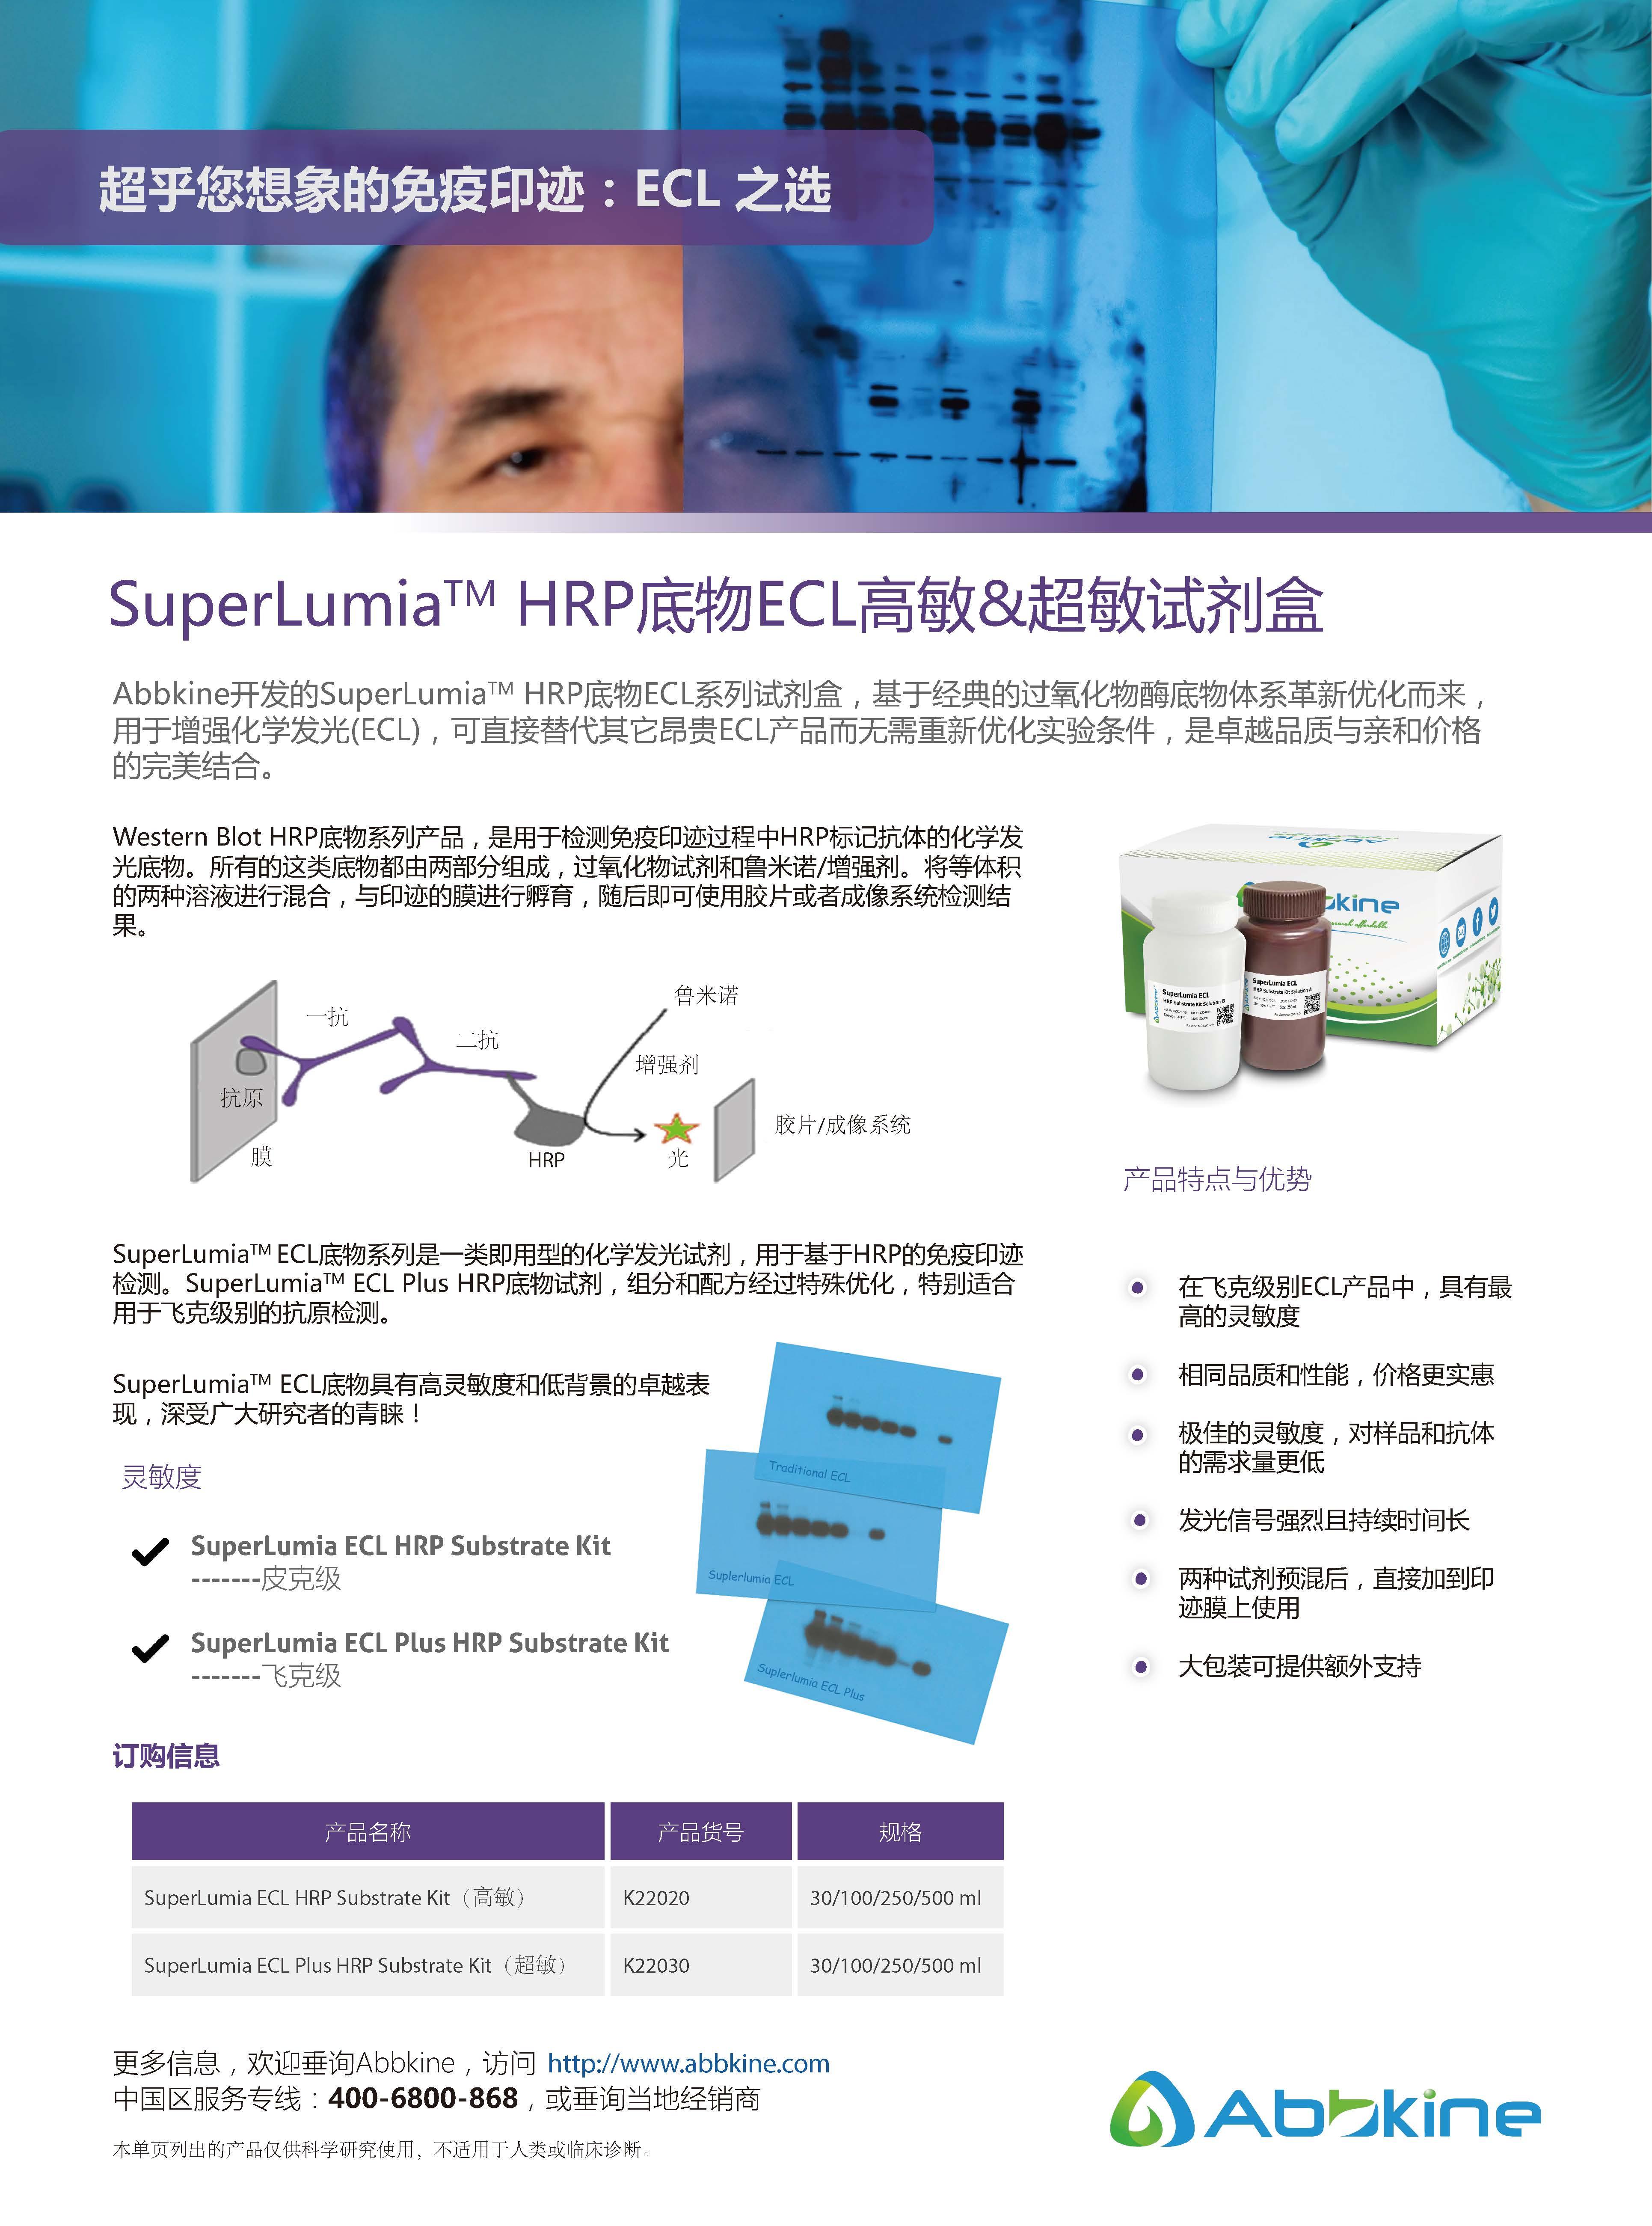 SuperLumia HRP底物ECL高敏&超敏试剂盒-产品手册